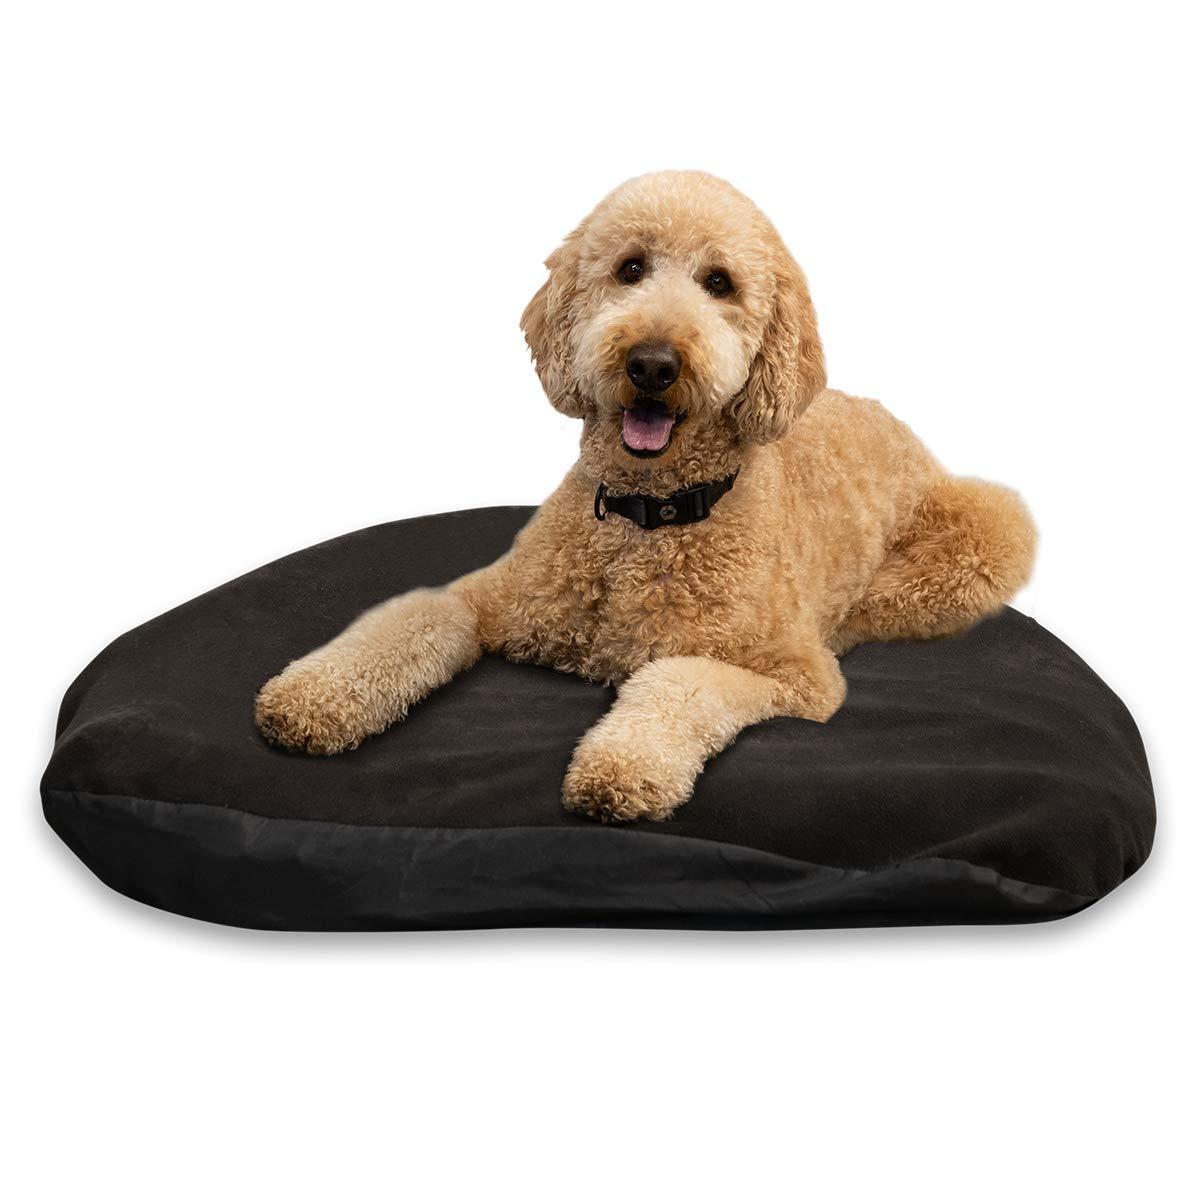 travel dog bed dog travel tips